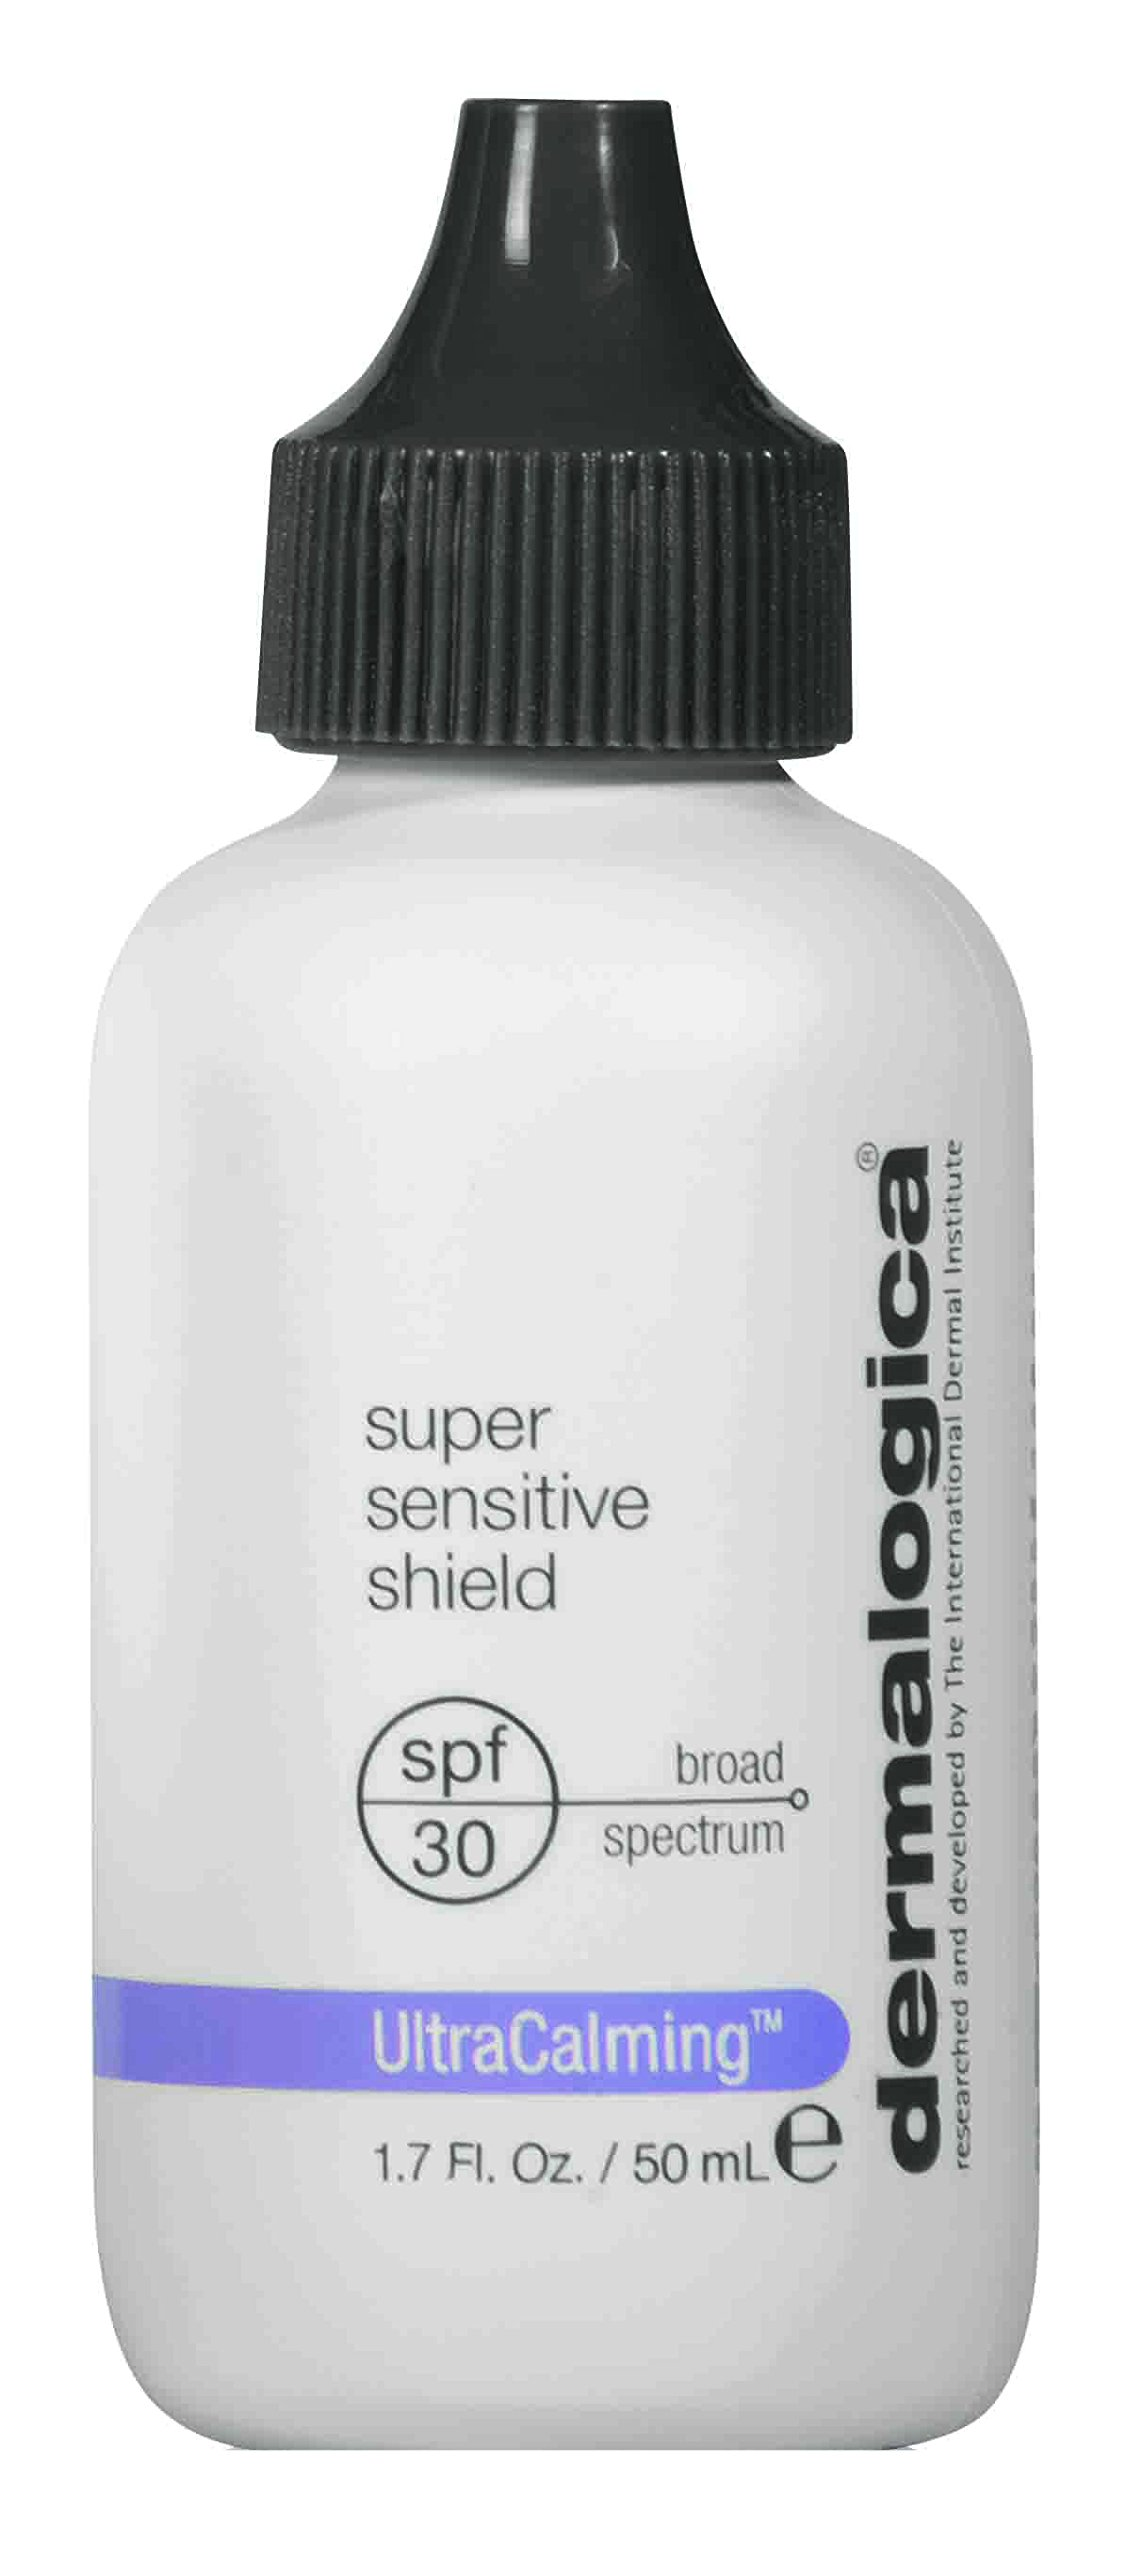 Dermalogica Super Sensitive Shield Sunscreen SPF 30, 1.7 Ounce